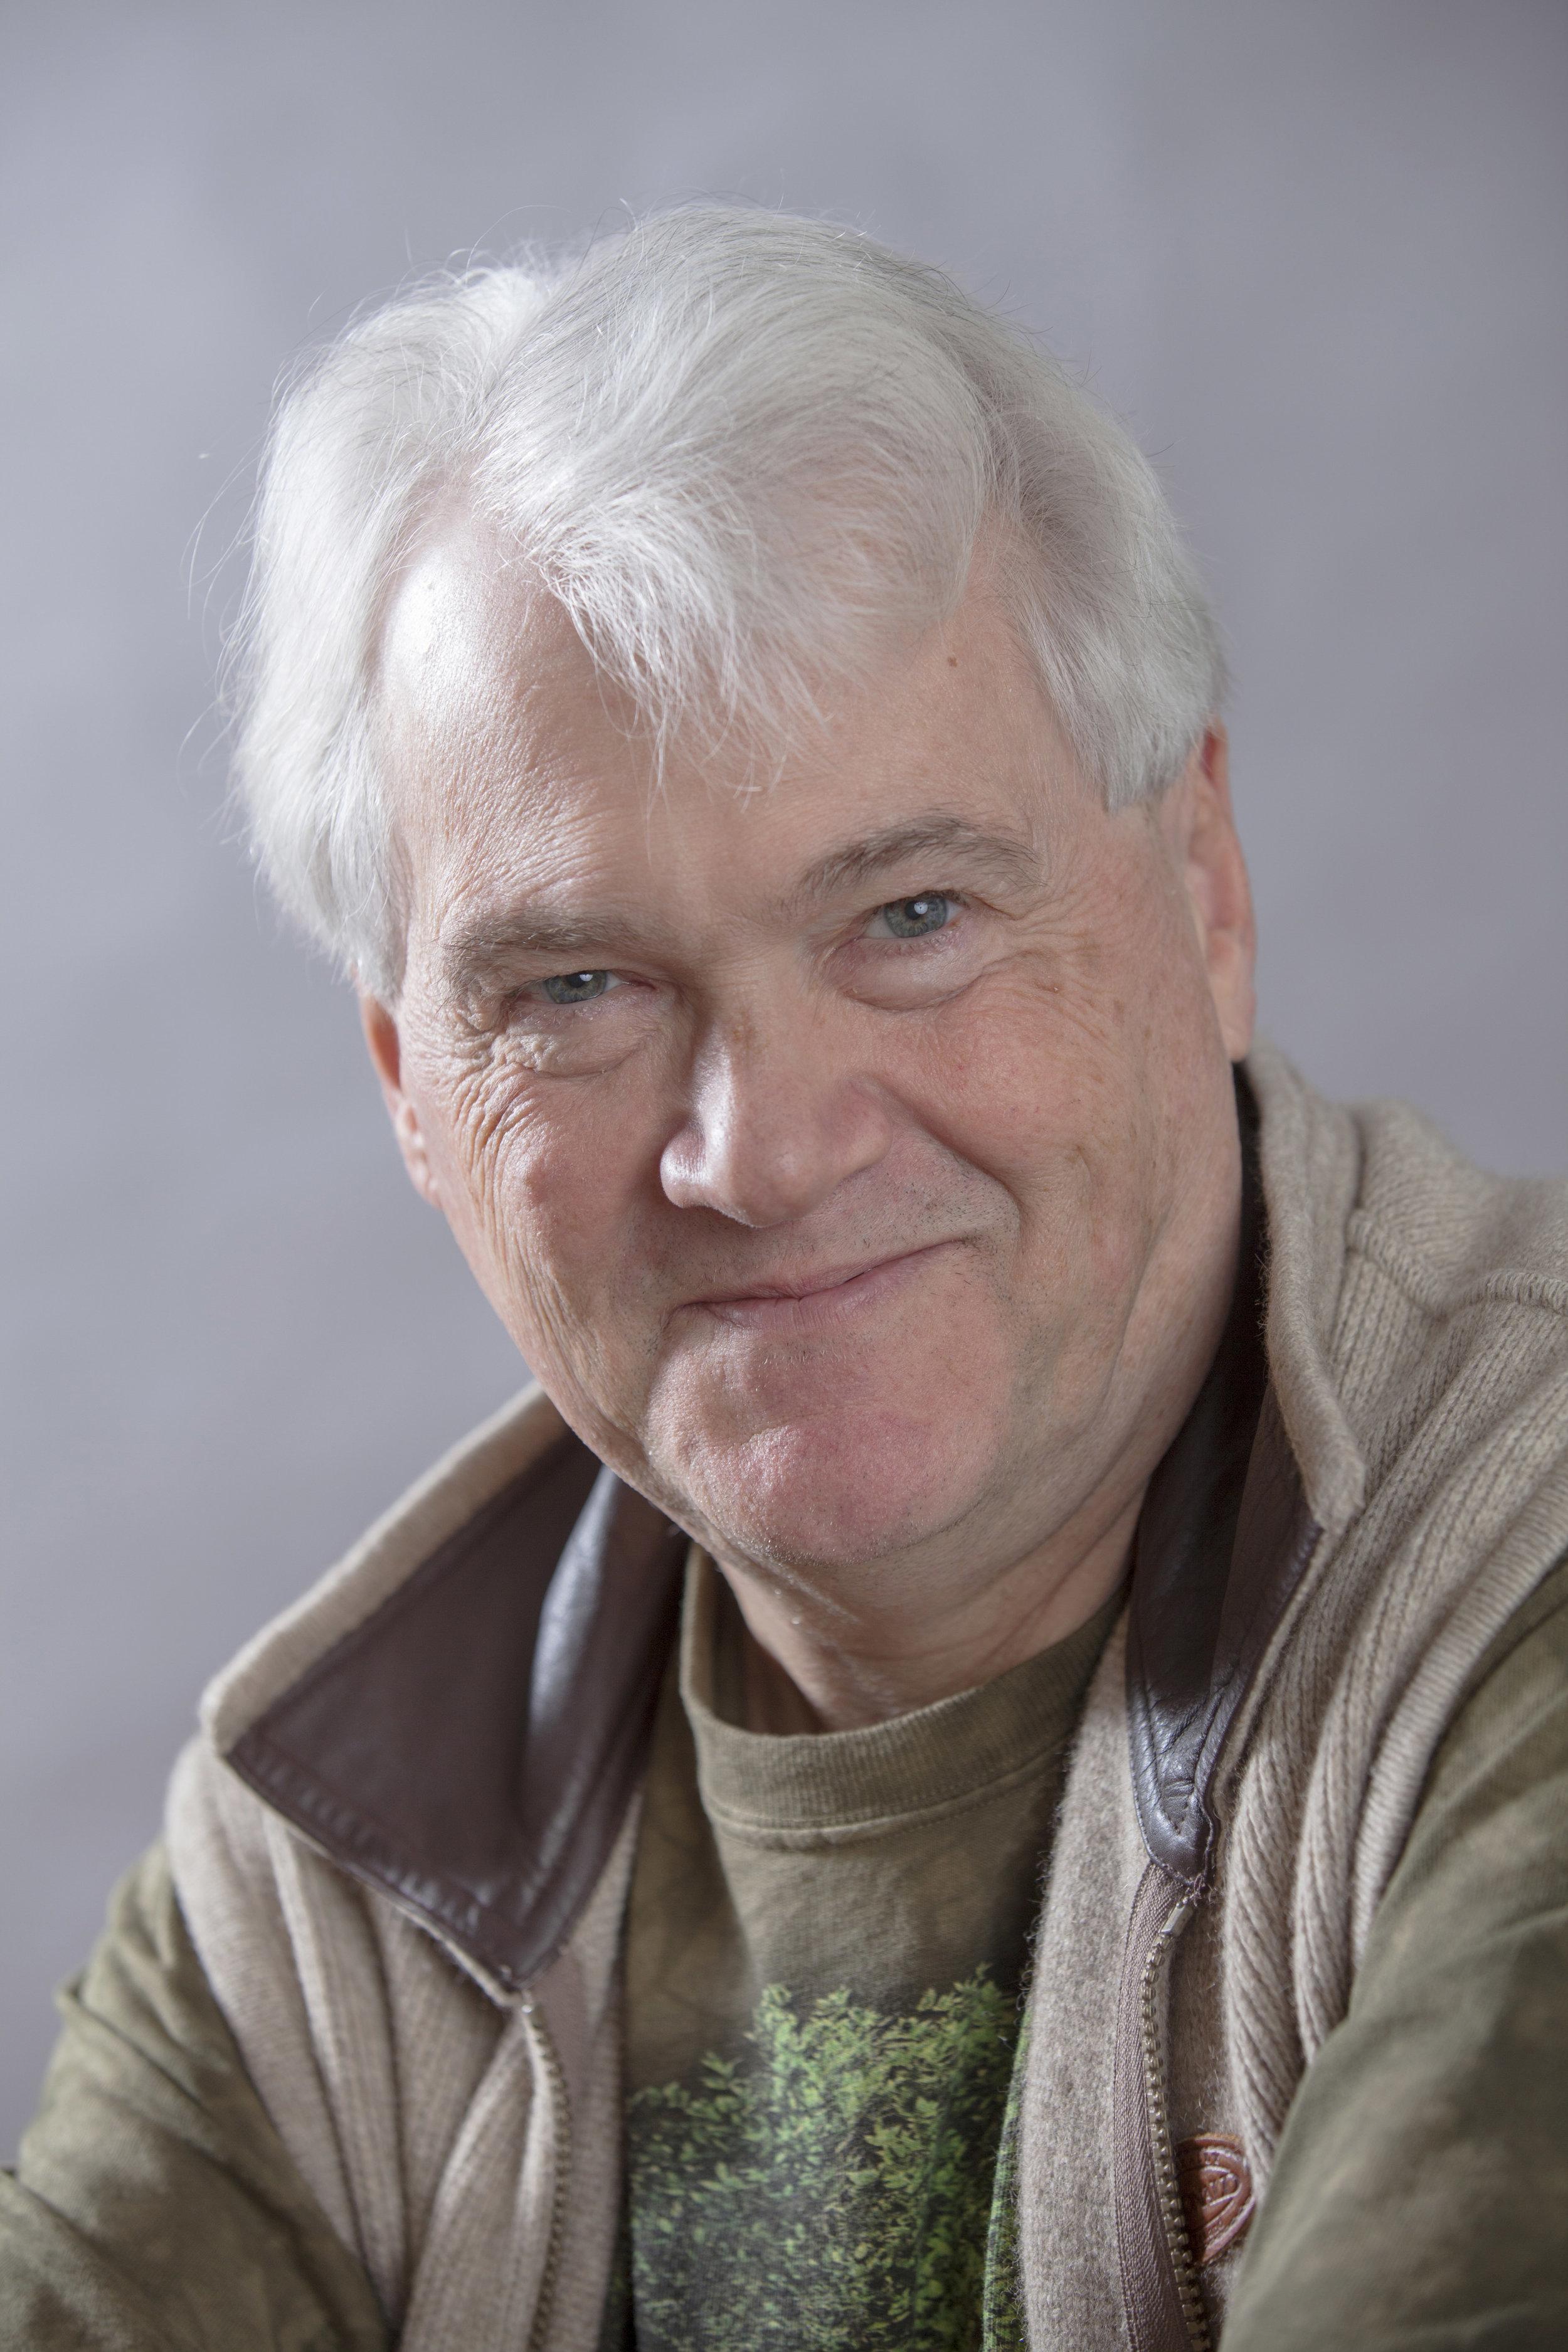 Peter J. Whitehouse MD, PhD